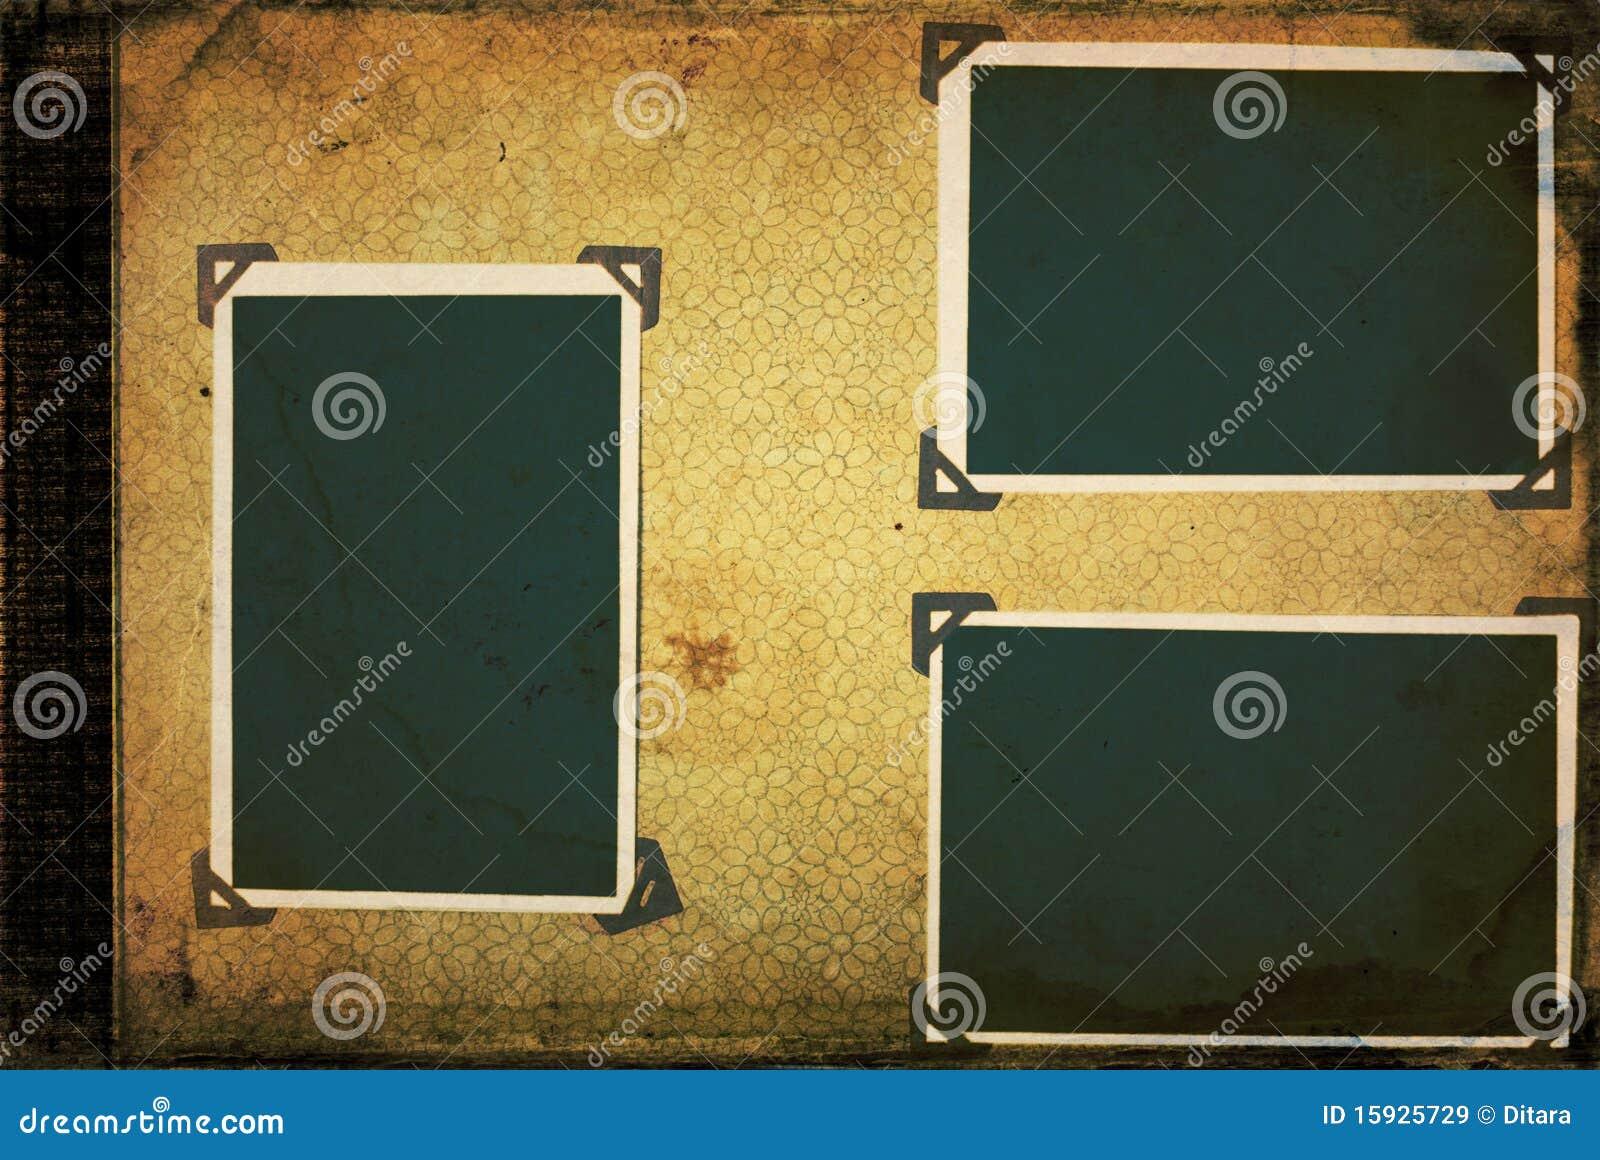 altes fotoalbum lizenzfreie stockbilder bild 15925729. Black Bedroom Furniture Sets. Home Design Ideas